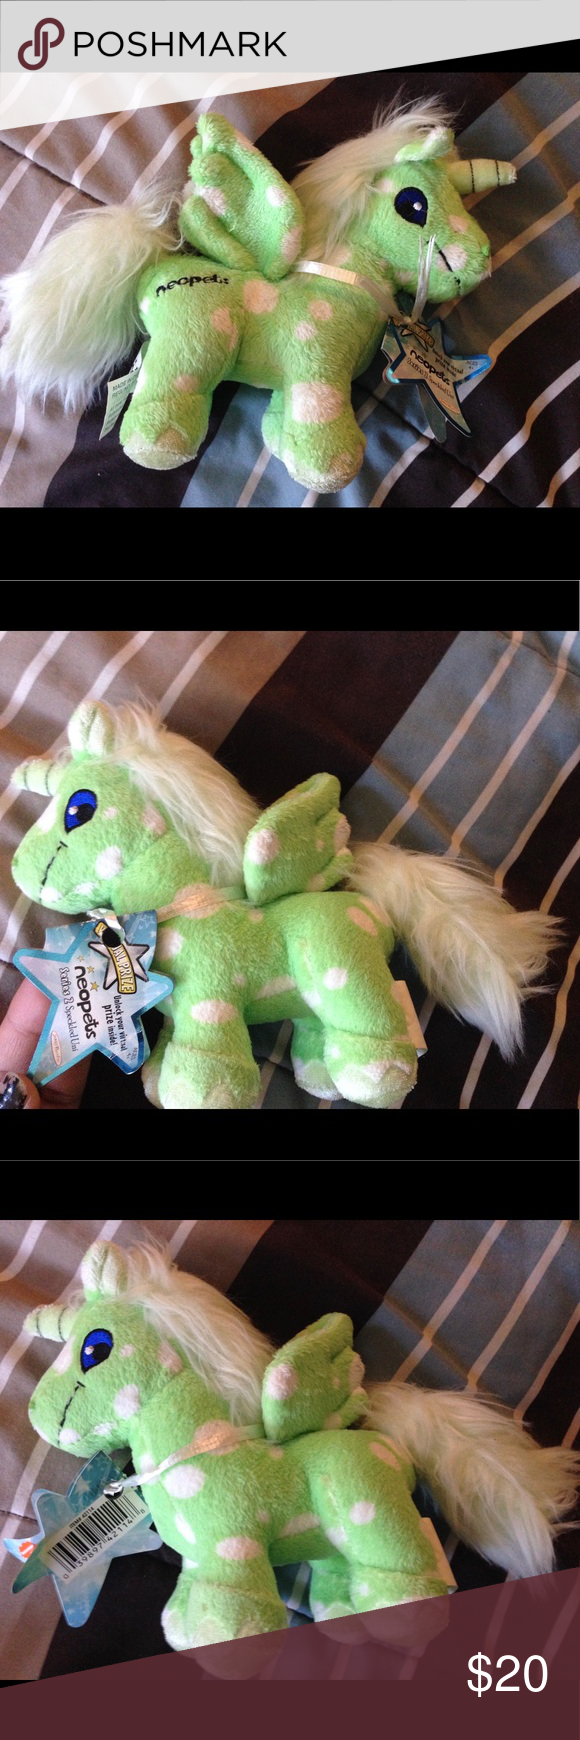 NWT Super Cute Neopets Unicorn Baby Dolls Toy Brand New